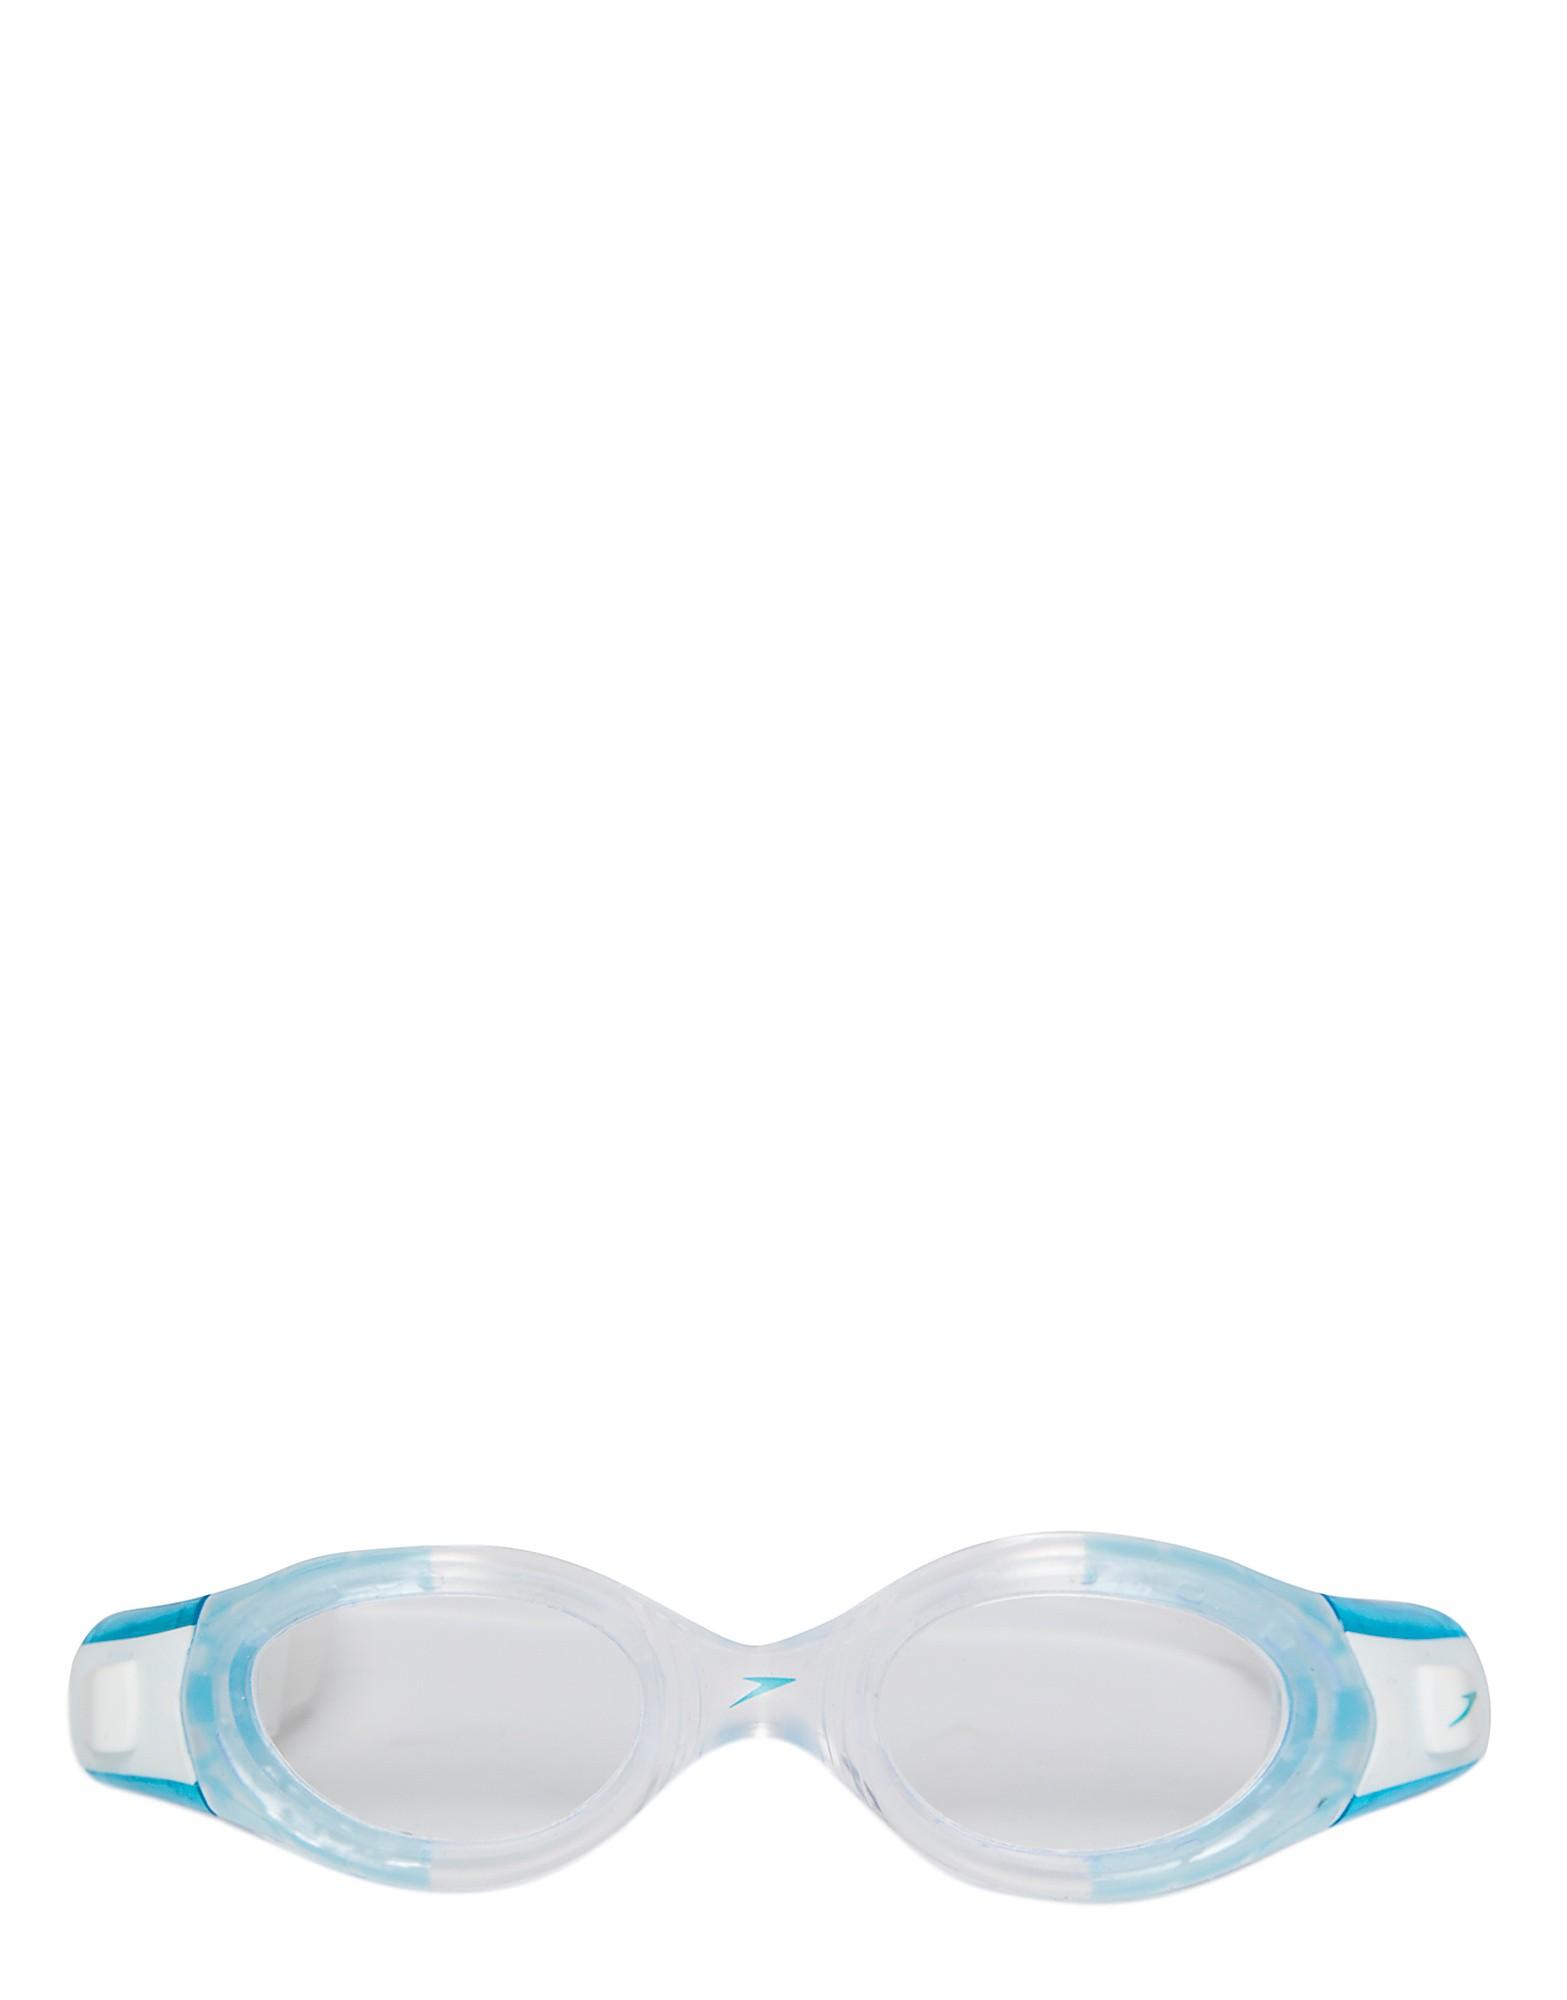 Speedo Futura Biofuse Goggles - Blue/Clear - Womens, Blue/Clear